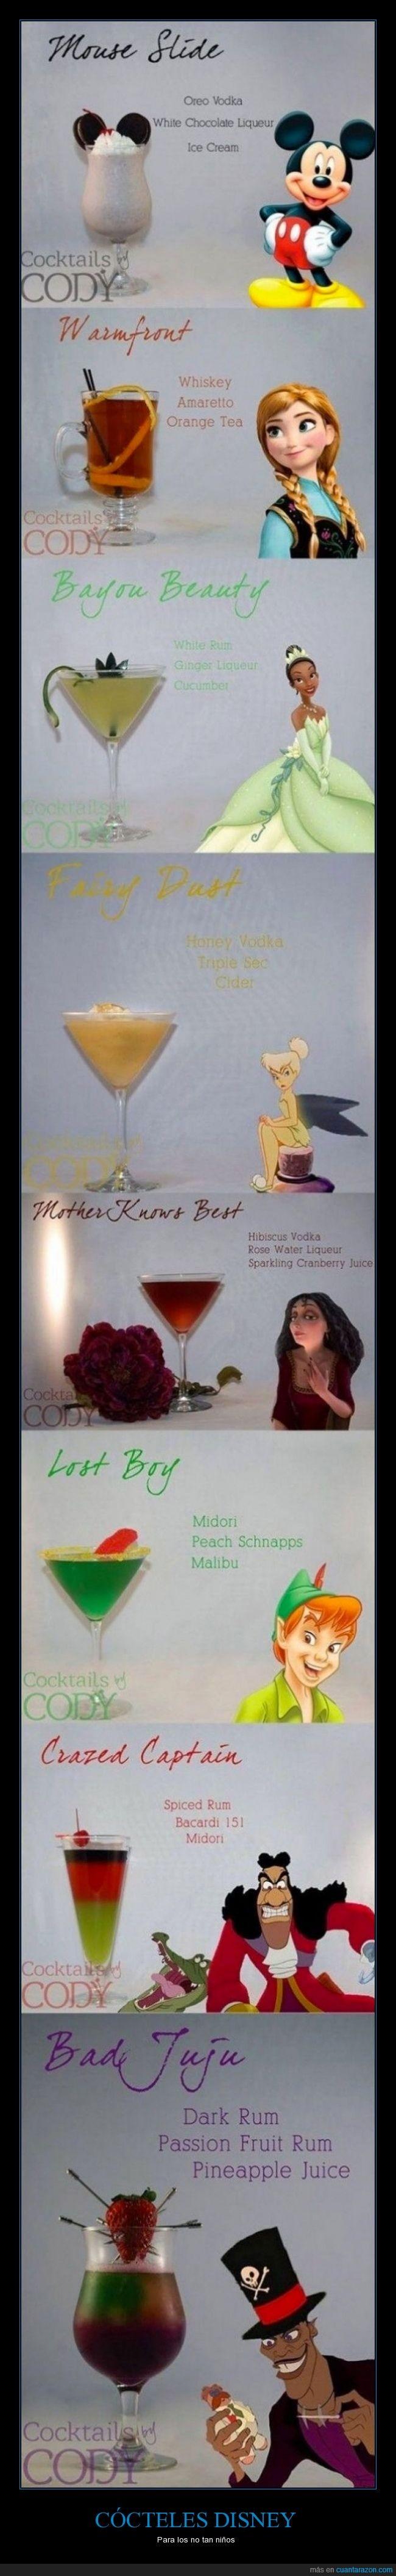 alcohol,bebida,cocktail,cóctel,Cody Winfrey,combinado,disney,inspirado,scar